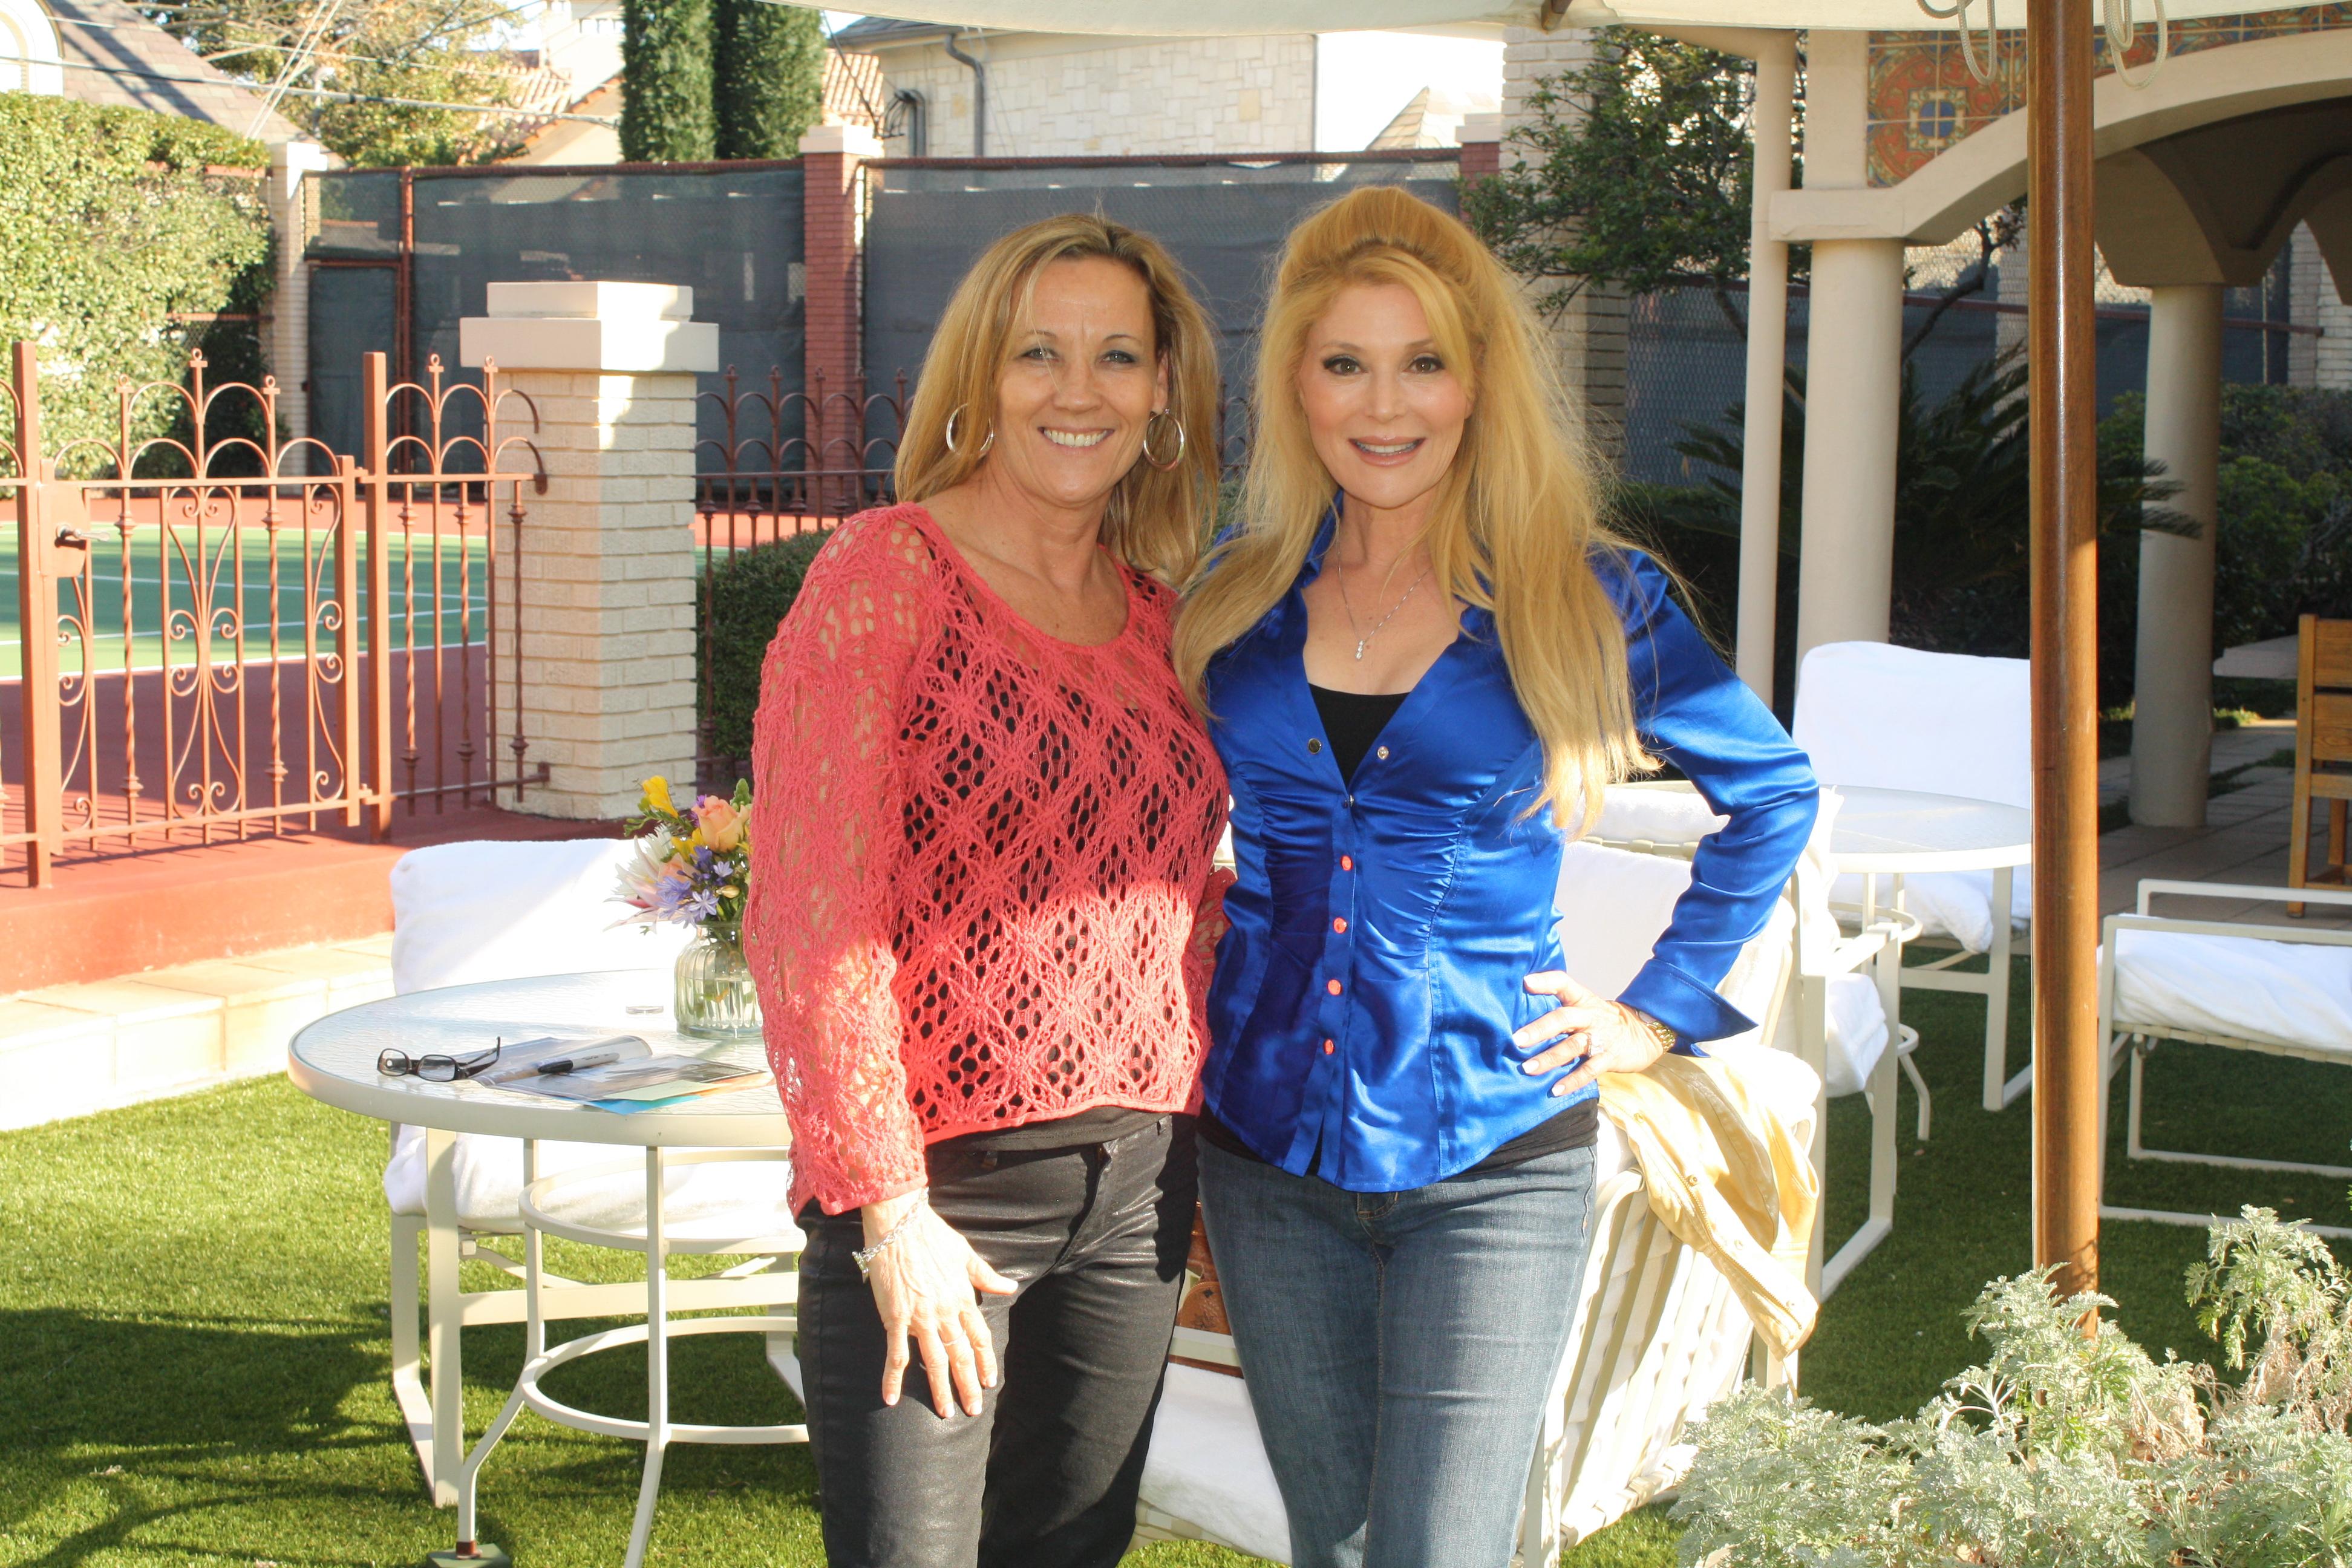 Audrey Landers Dallas fan fave: audrey landers visits friends in dallas | dallas